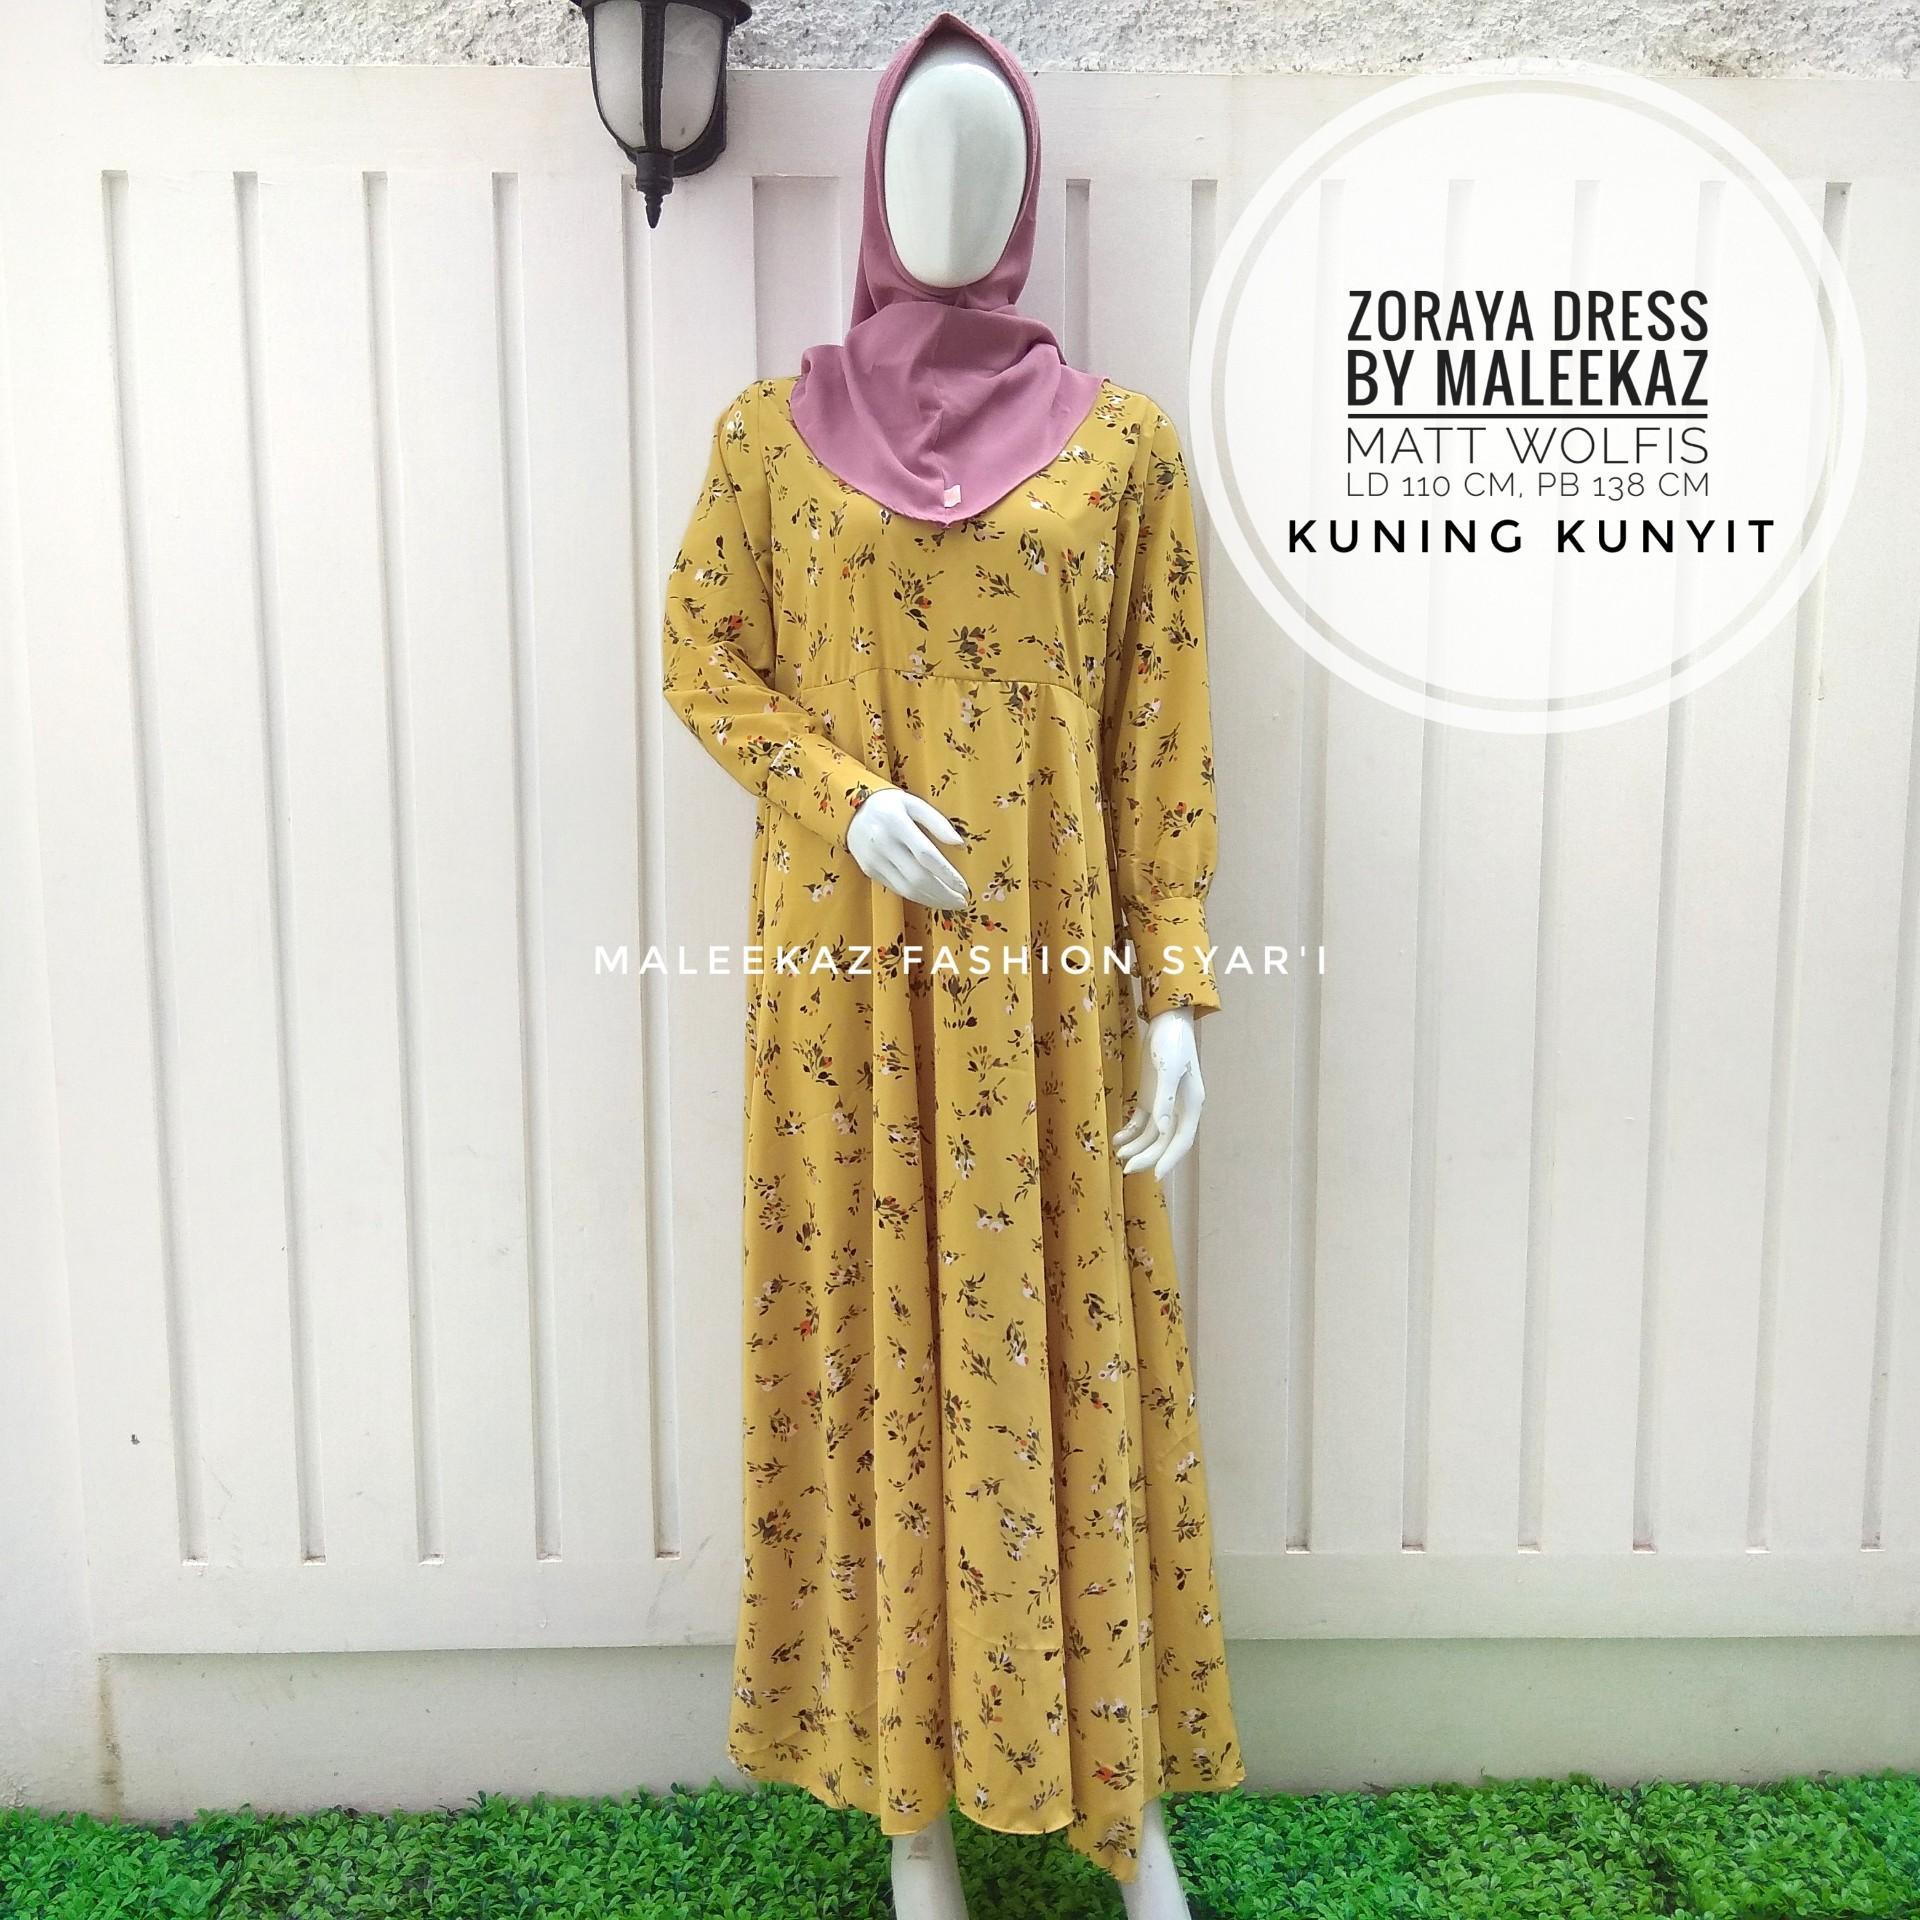 MaleekaZ Fashion Baju Gamis Syari Busui Motif Bunga Baju Fashion Muslim Wanita Syar i Gaun Pesta Muslimah Maxi Dress Lengan Panjang Long Dress